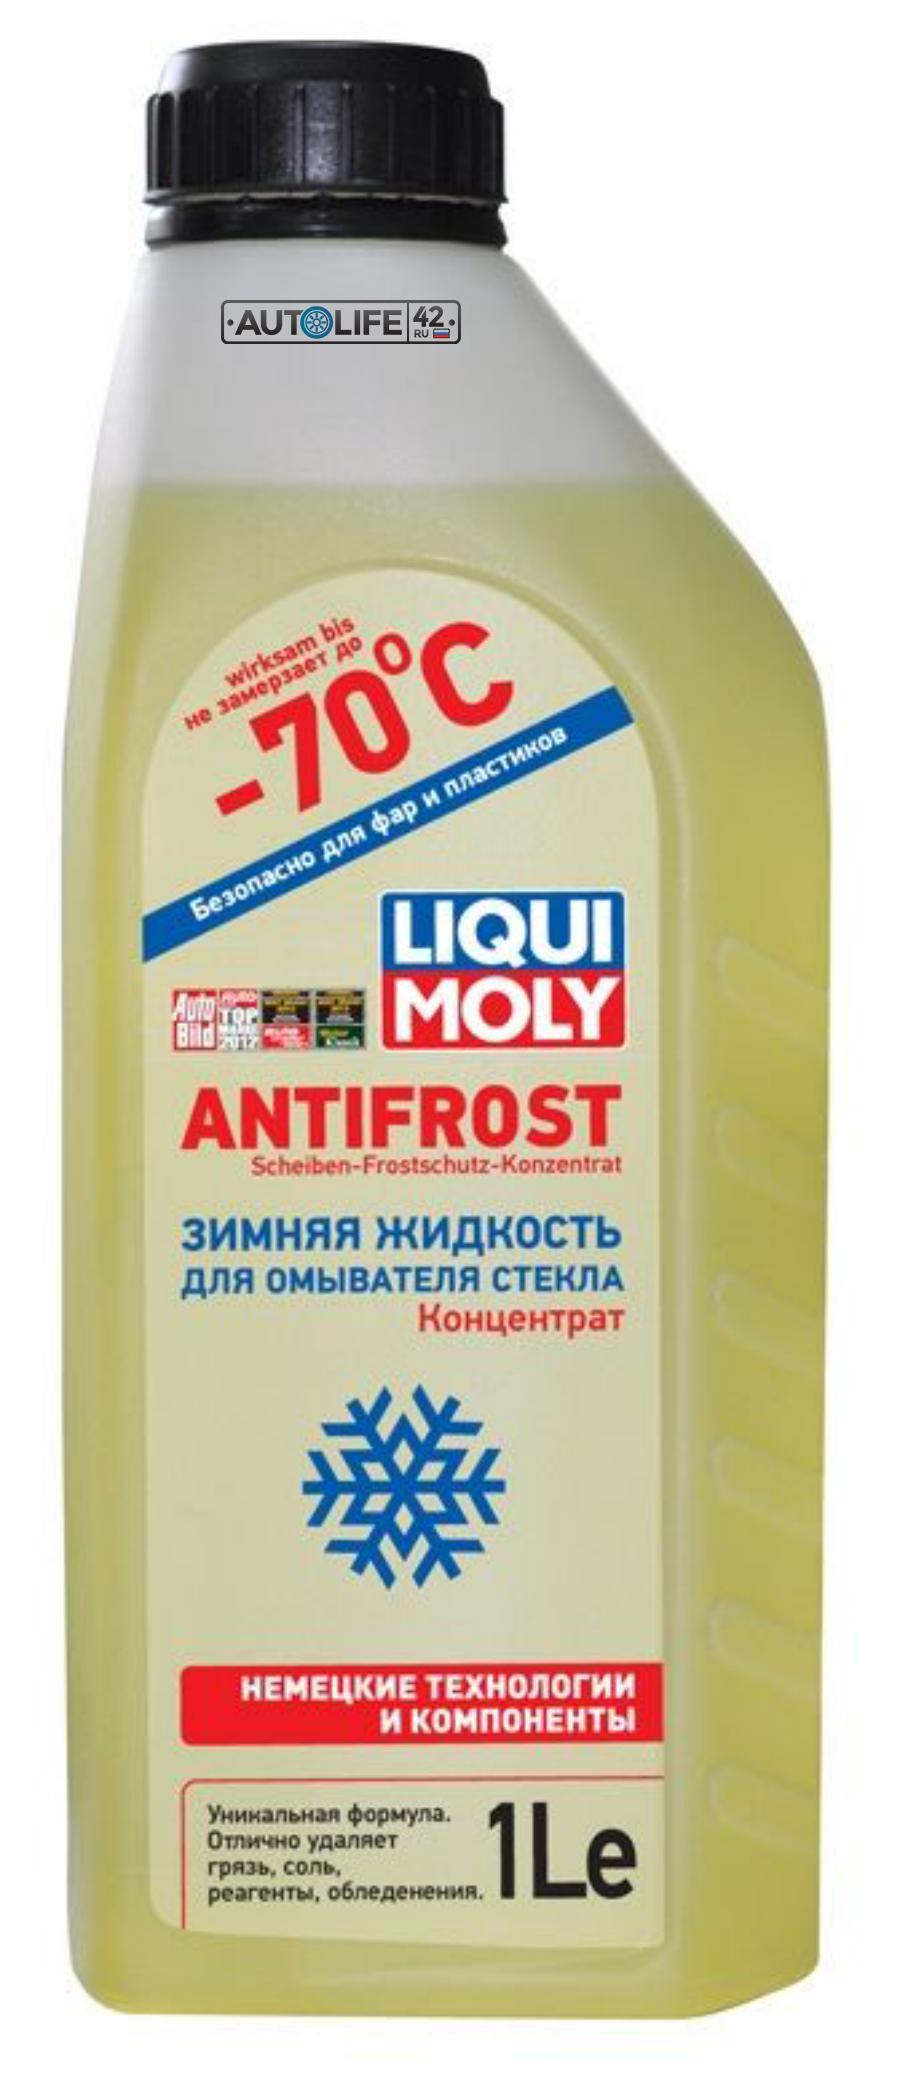 "Стеклоомывающая жидкость концентрат ""Antifrost Scheiben-Frostschutz Konzentrat"" (-70C)"